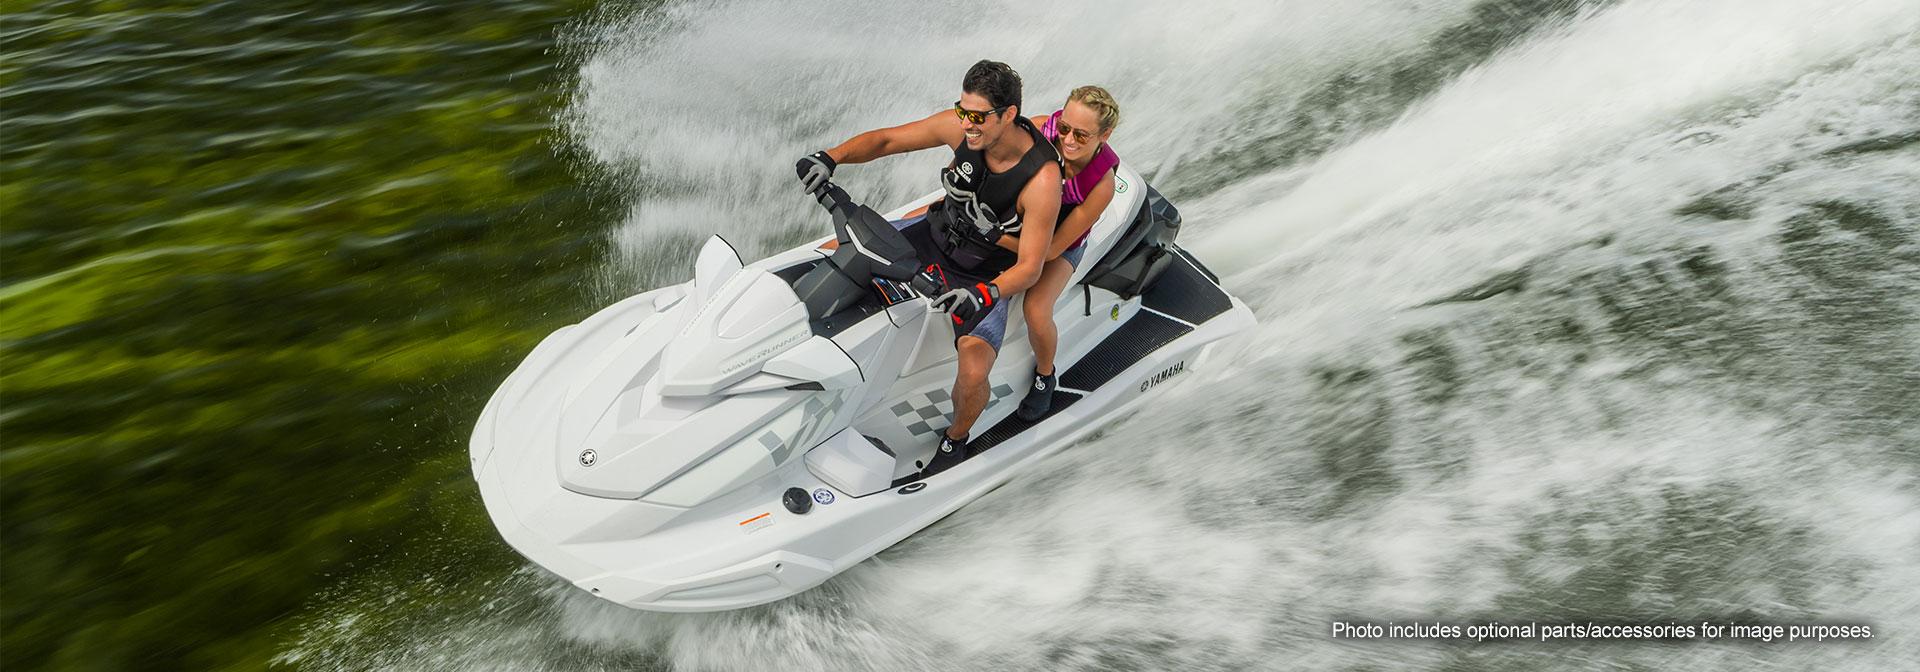 VX Cruiser HO : Features - WaveRunner(PWC, MarineJet) | Yamaha Motor